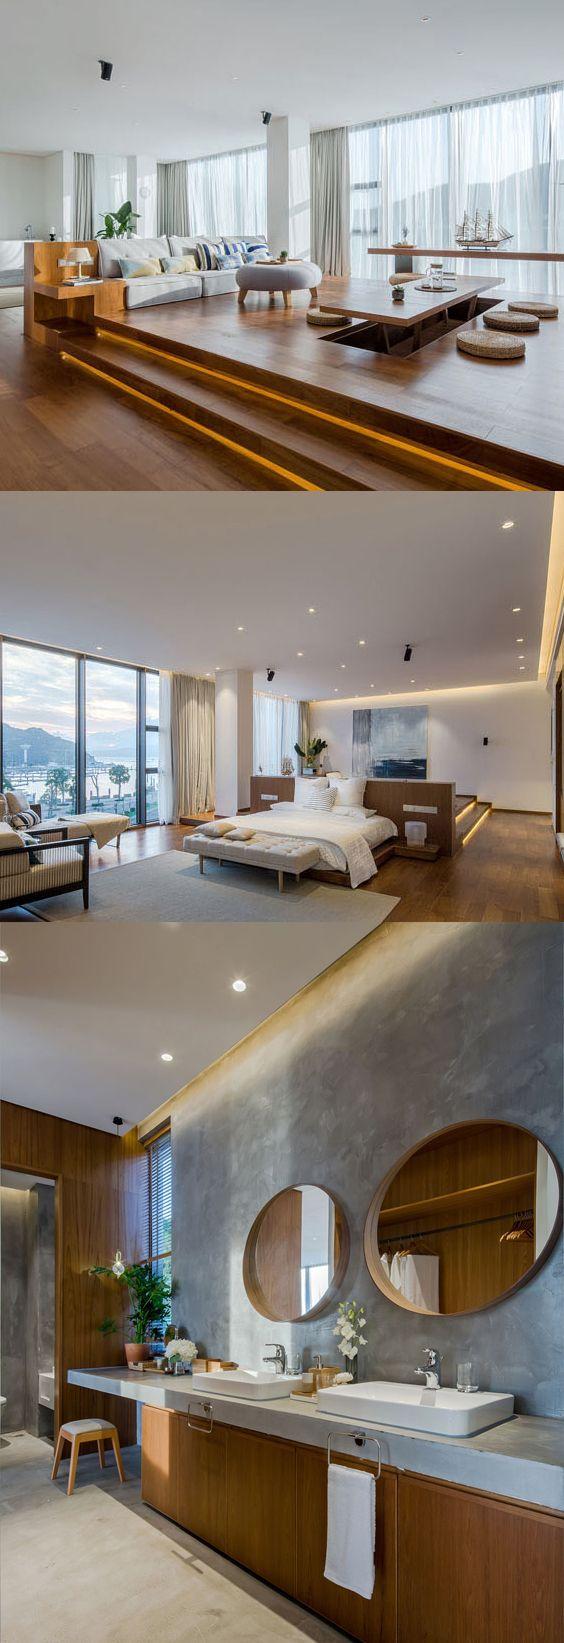 Modern Chinese Apartment #homedesignlover #homedecor #homedesign #homeideas #apartment